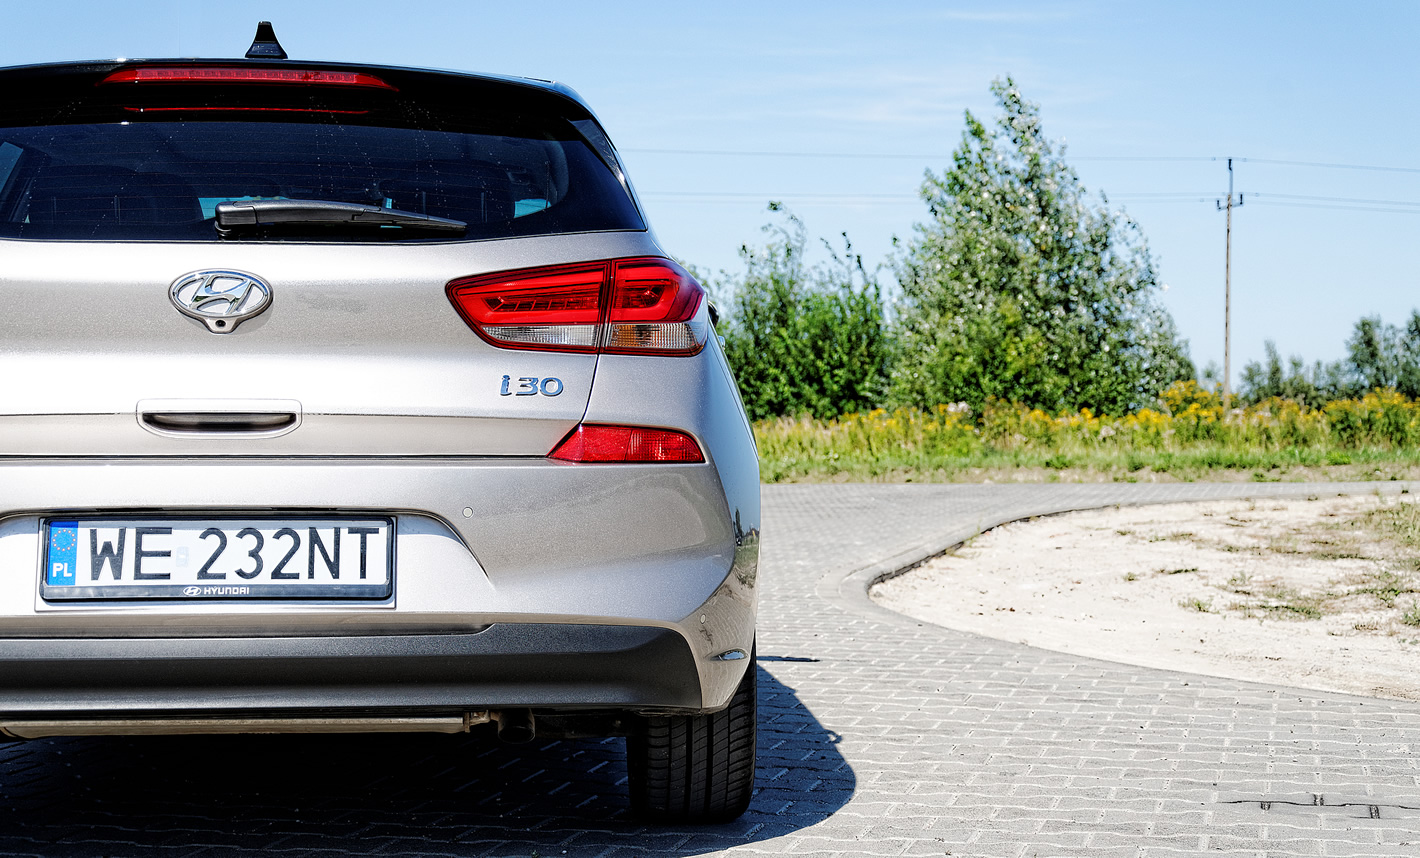 Hyundai i30 to komfortowo zestrojony samochód